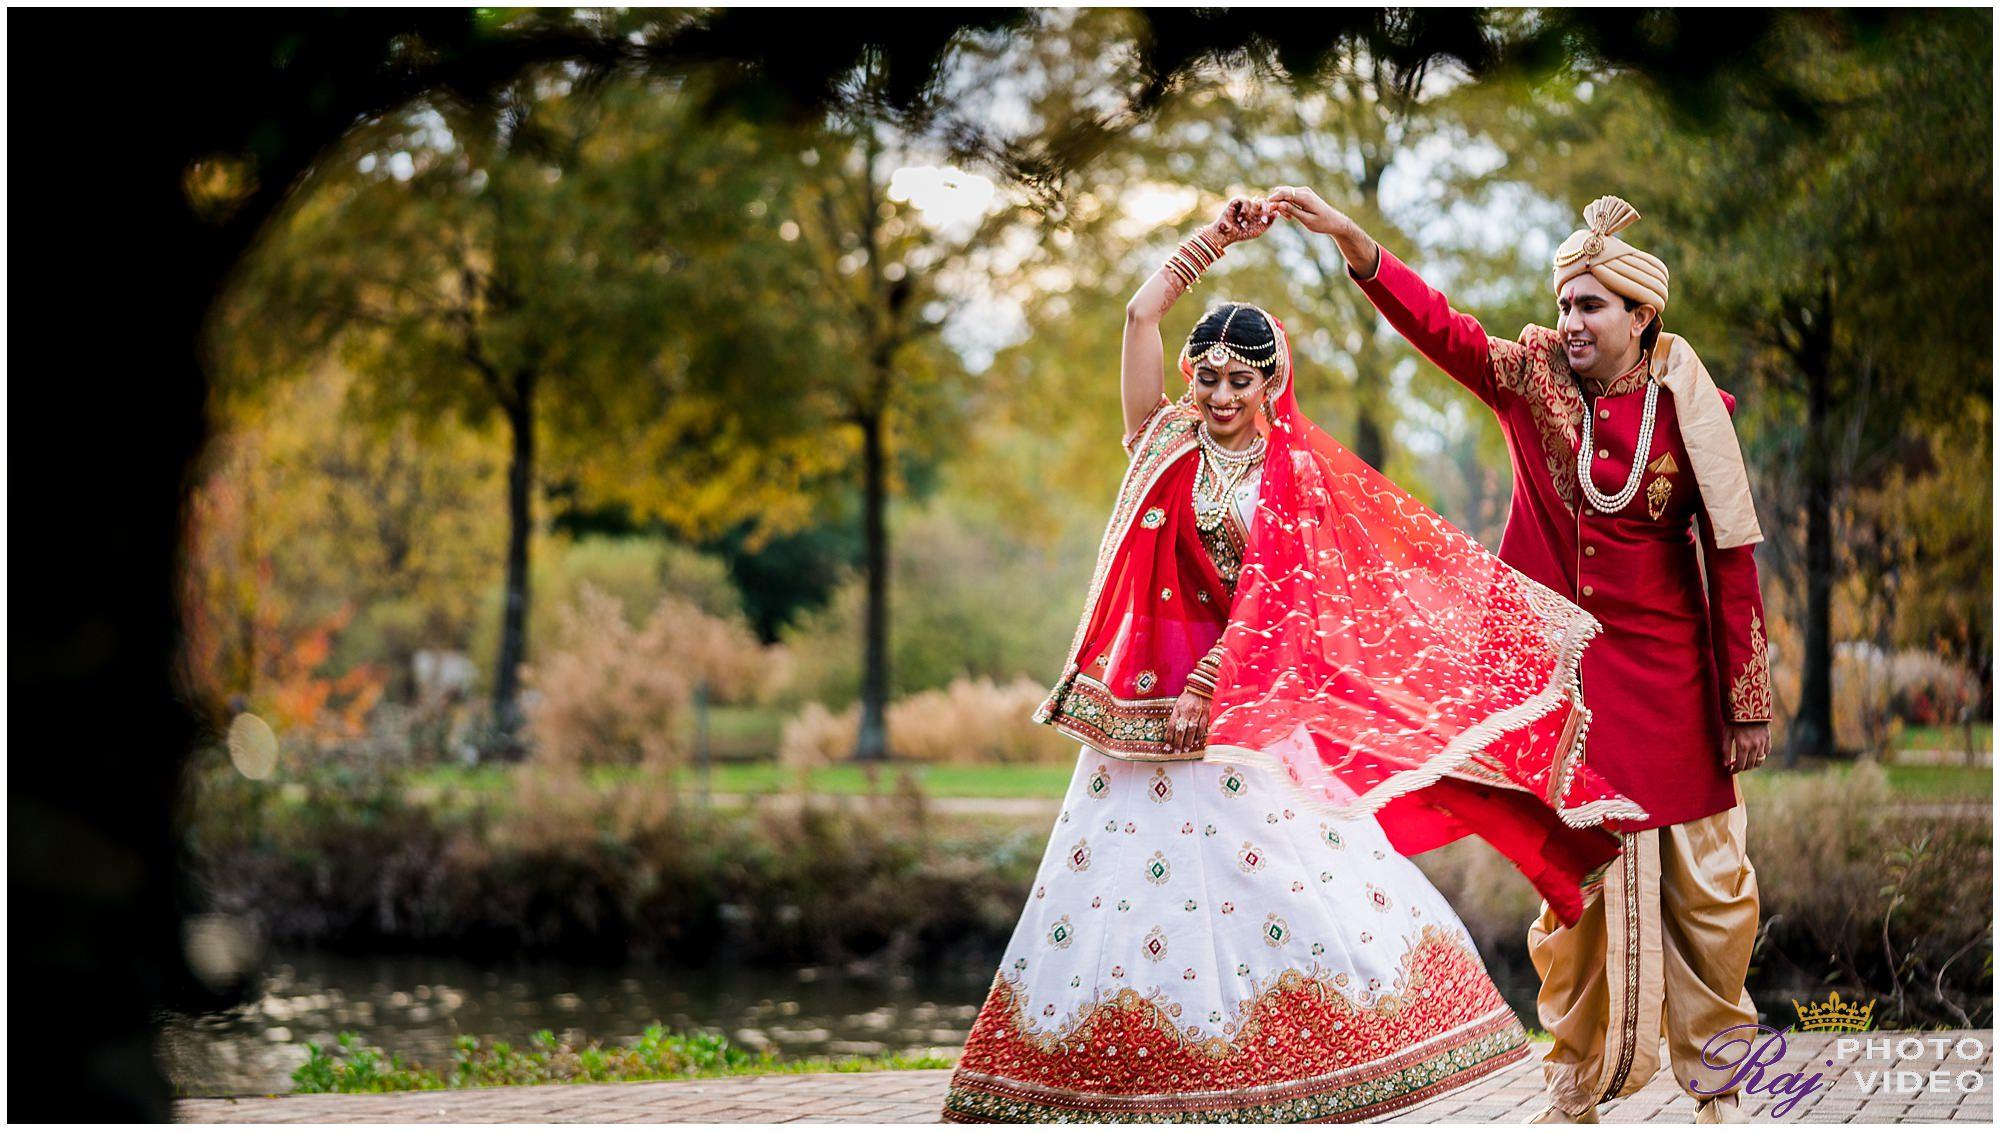 Founders-Inn-and-Spa-Virginia-Beach-VA-Indian-Wedding-Harini-Vivek-62.jpg